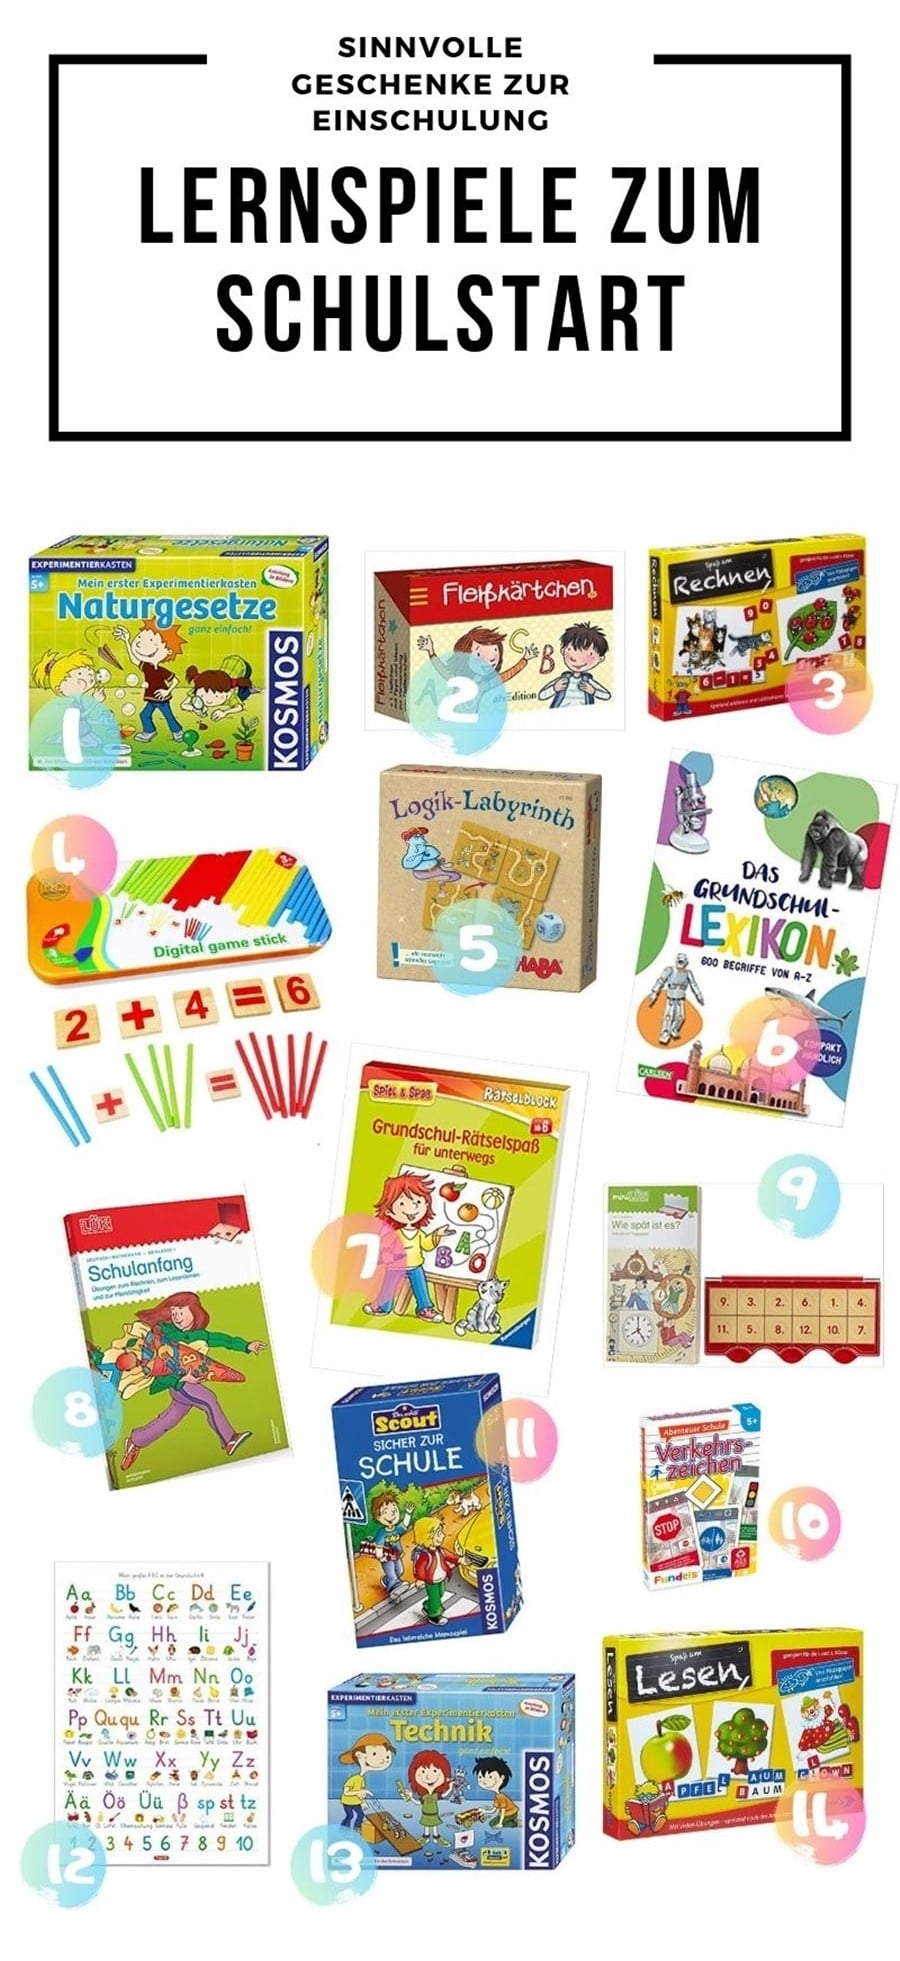 Geschenke zur Einschulung? Entdecke sinnvolle Geschenkidee zur Einschulung und Kleinigkeiten zum Schultüte füllen